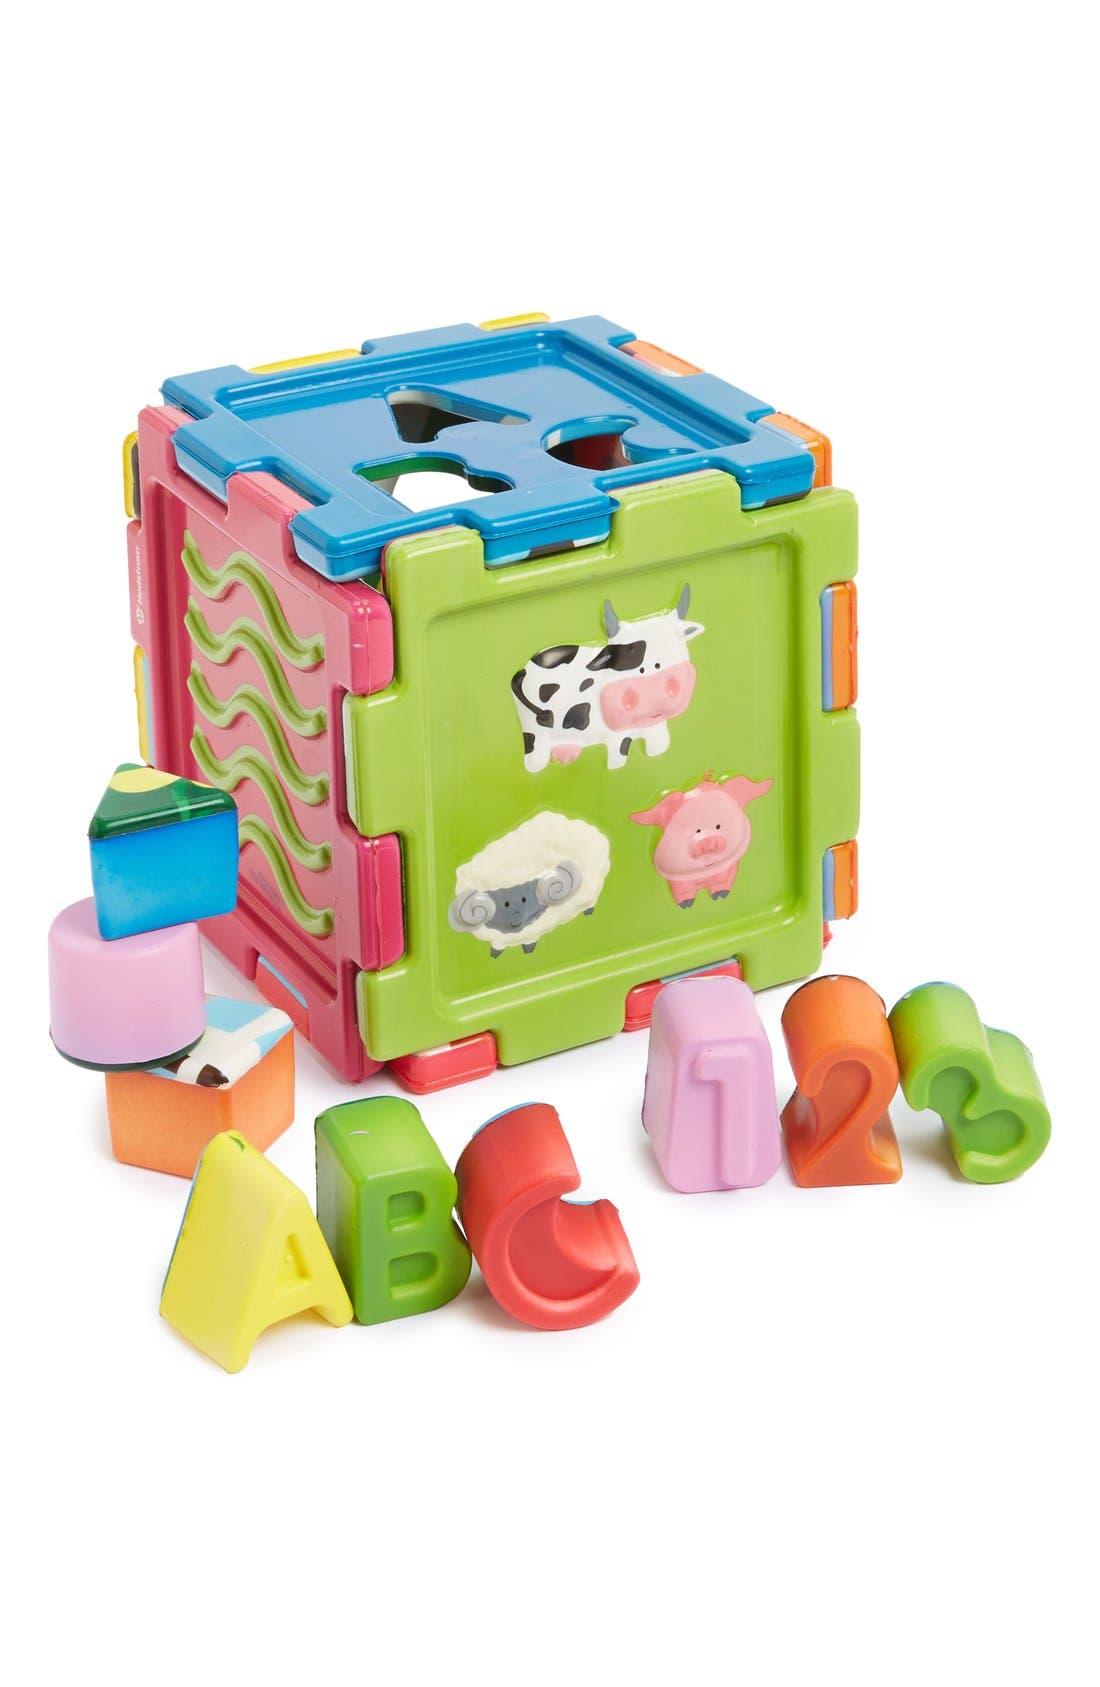 'Sensory Cube' Toy Set,                             Main thumbnail 1, color,                             400